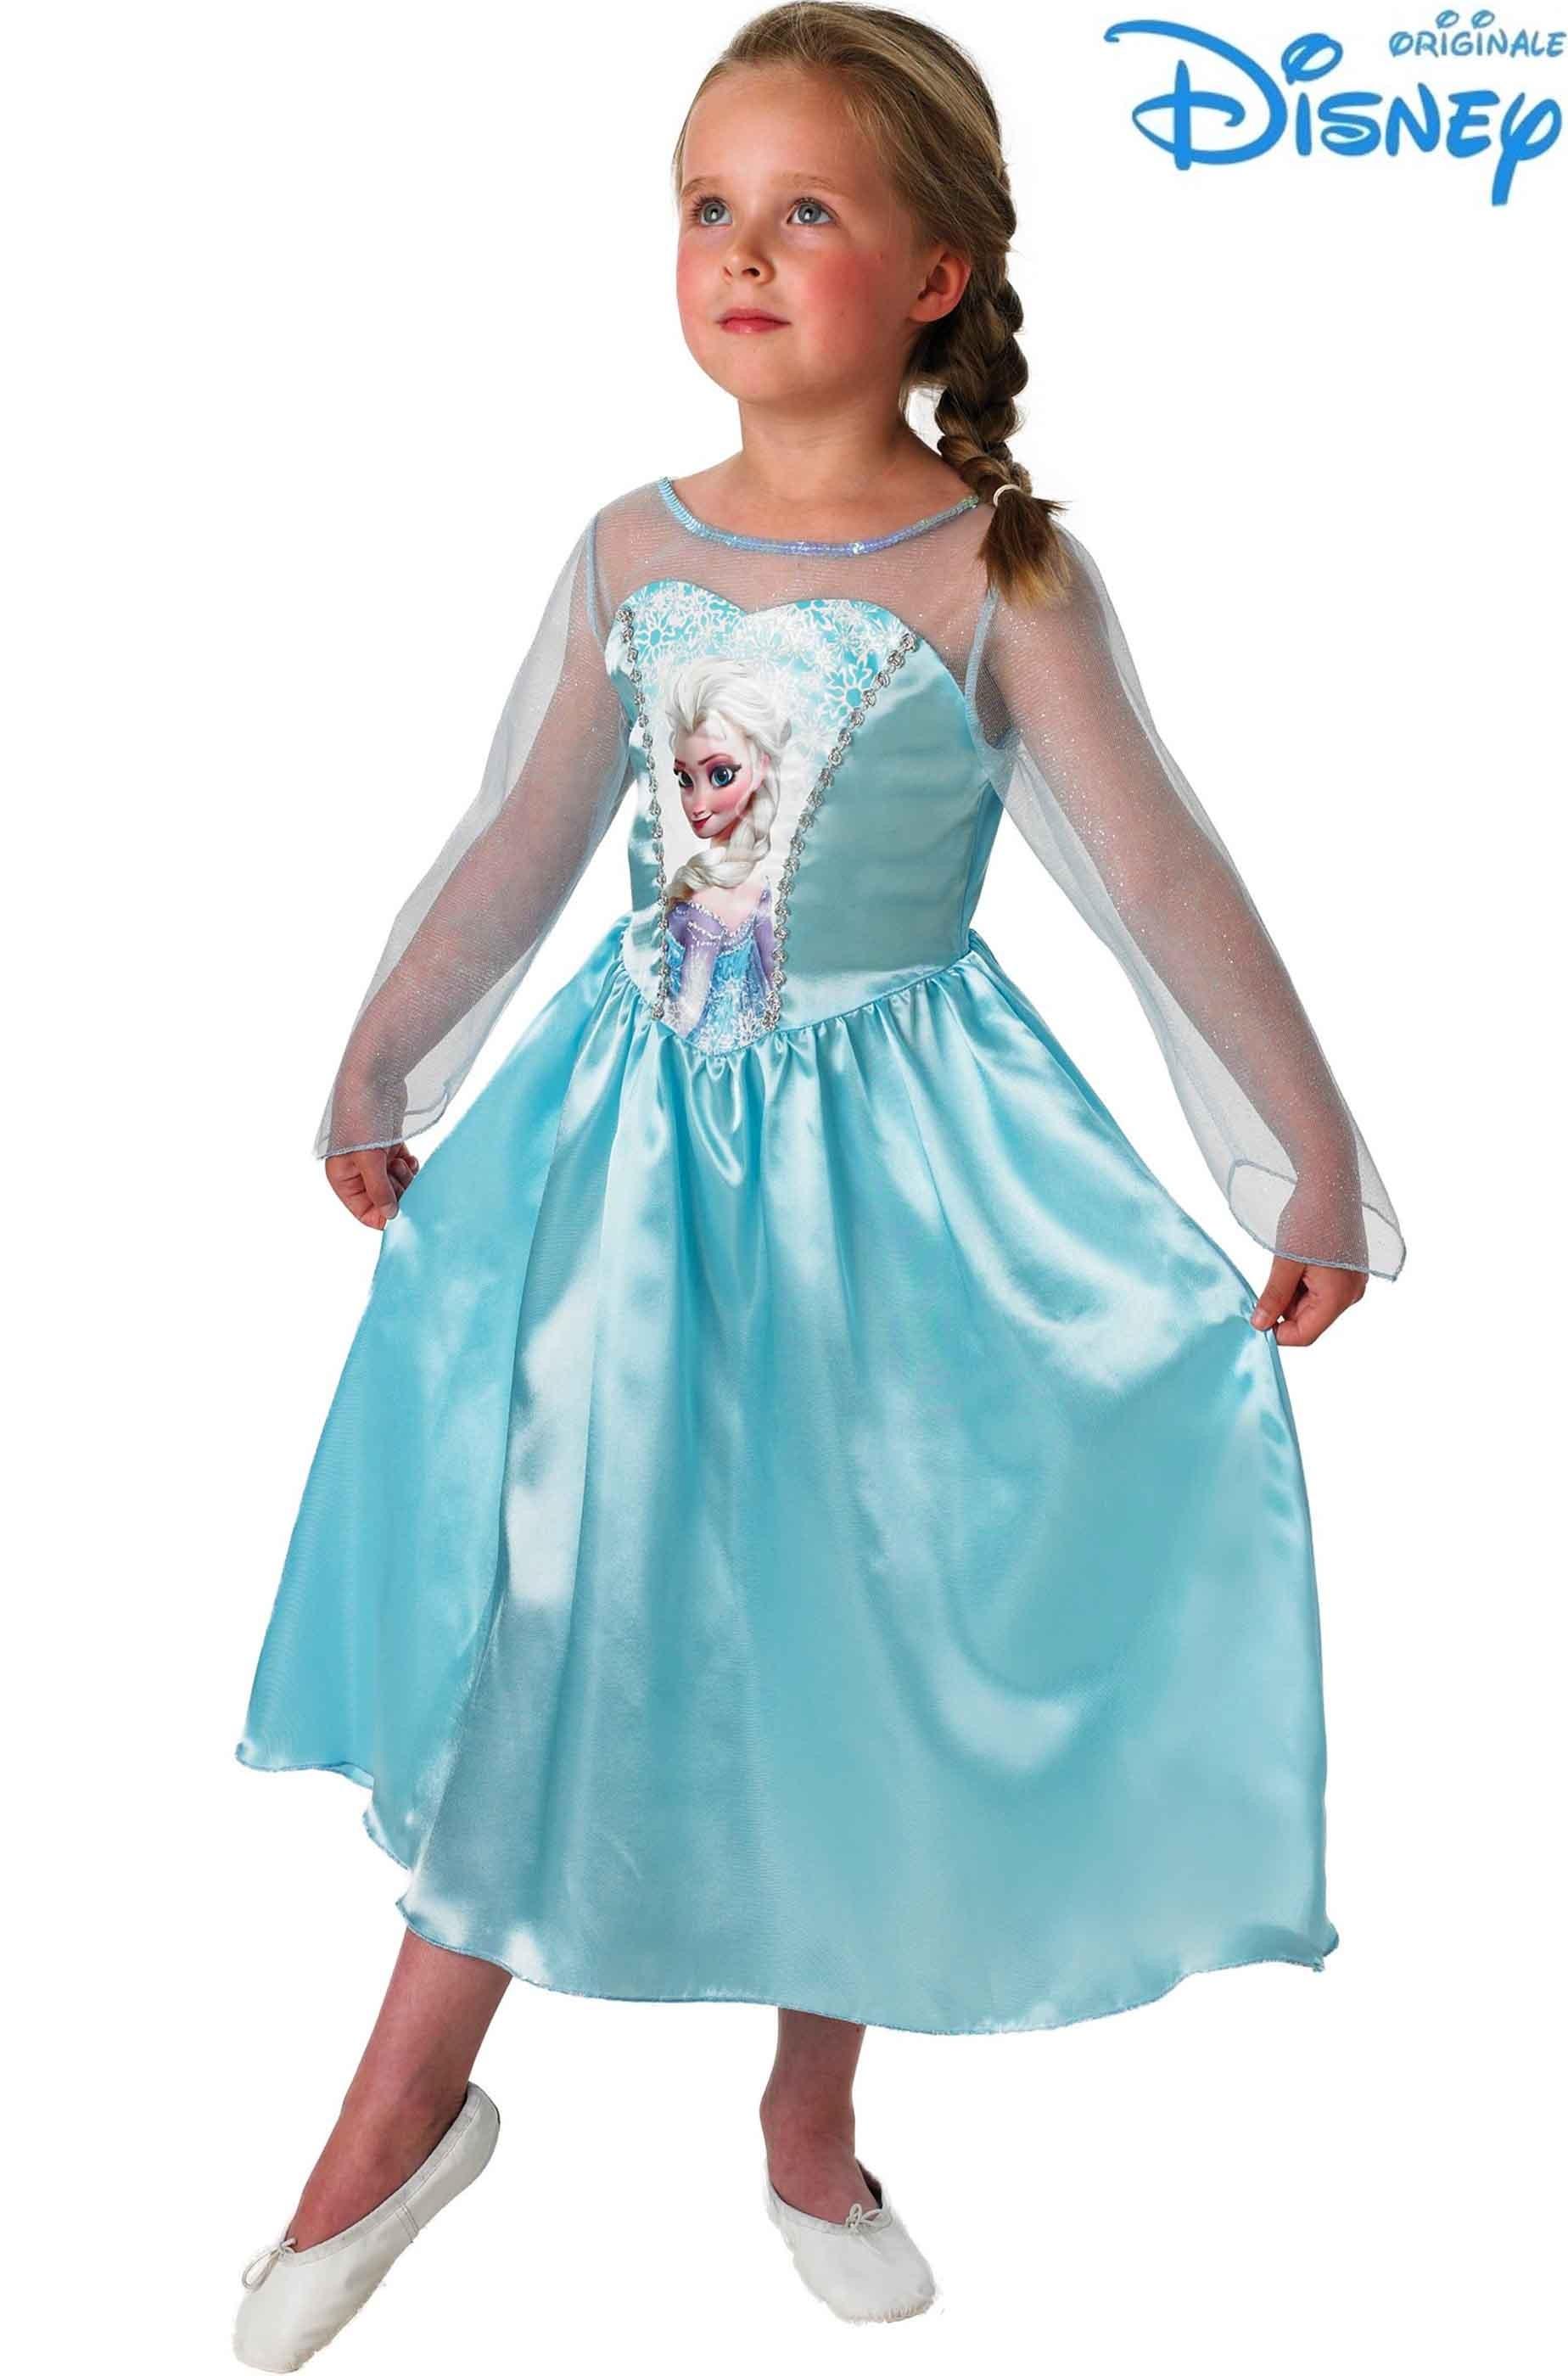 Vendita online di costumi di carnevale ed Halloween per bambini dai ... f5cee671d7f